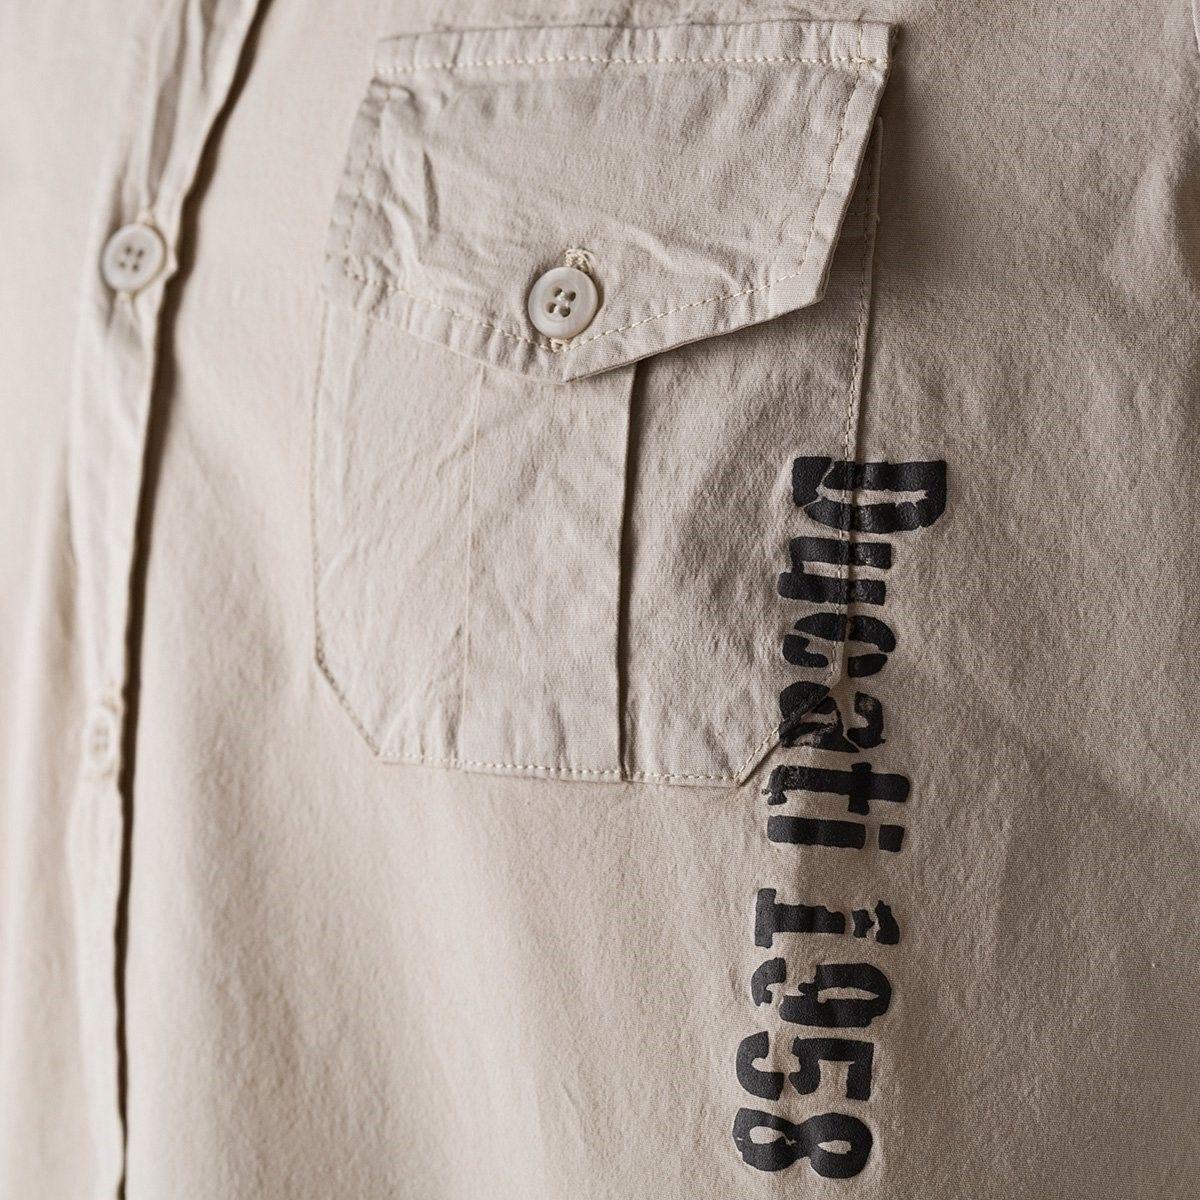 【DUCATI performance】復古襯衫 - 「Webike-摩托百貨」